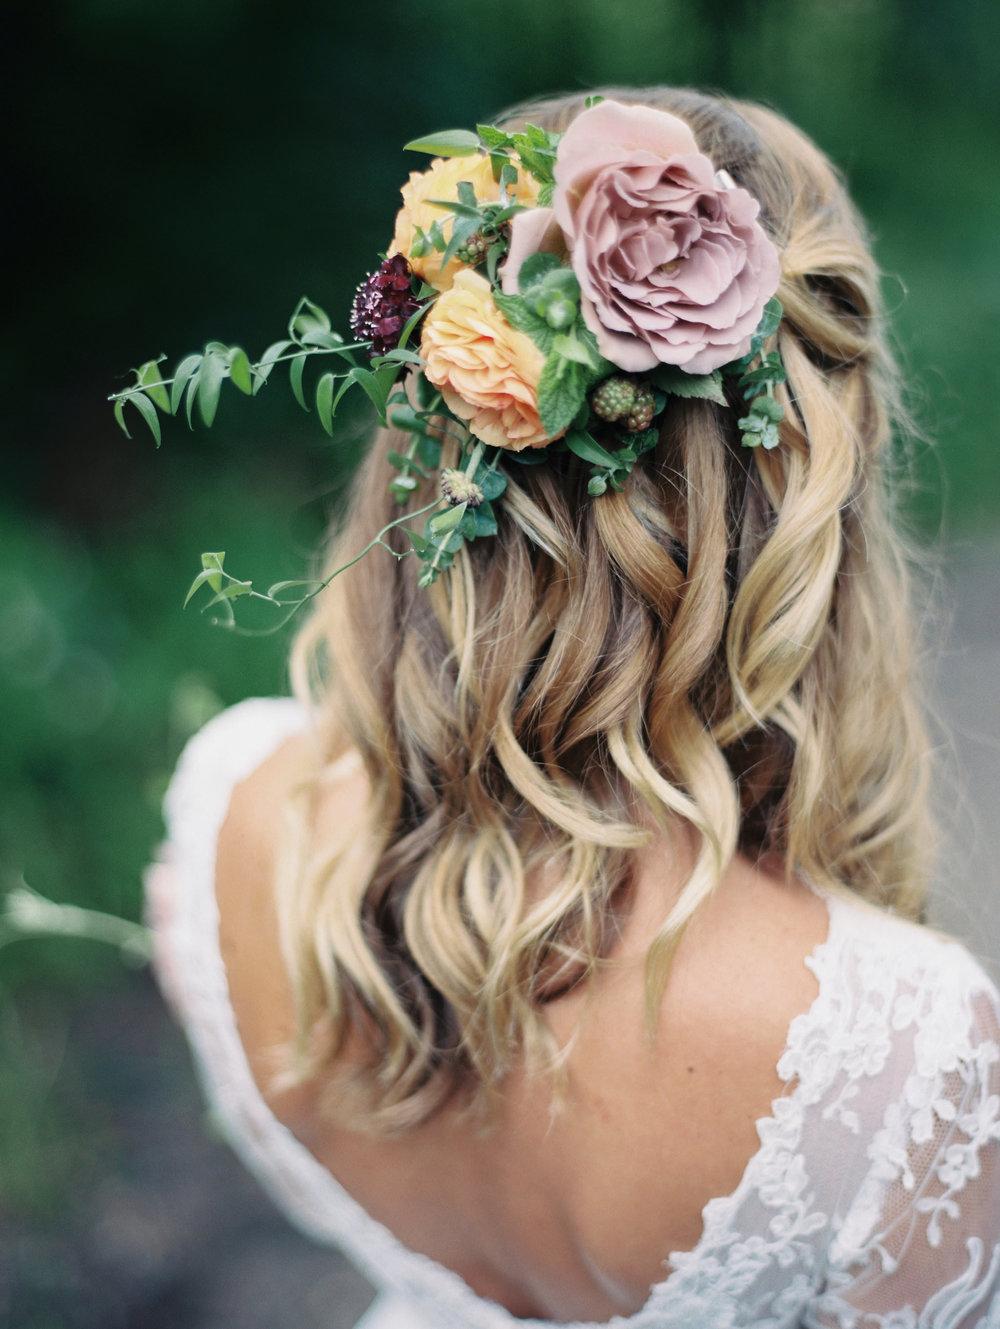 WhitneyEric-Wedding-228.JPG